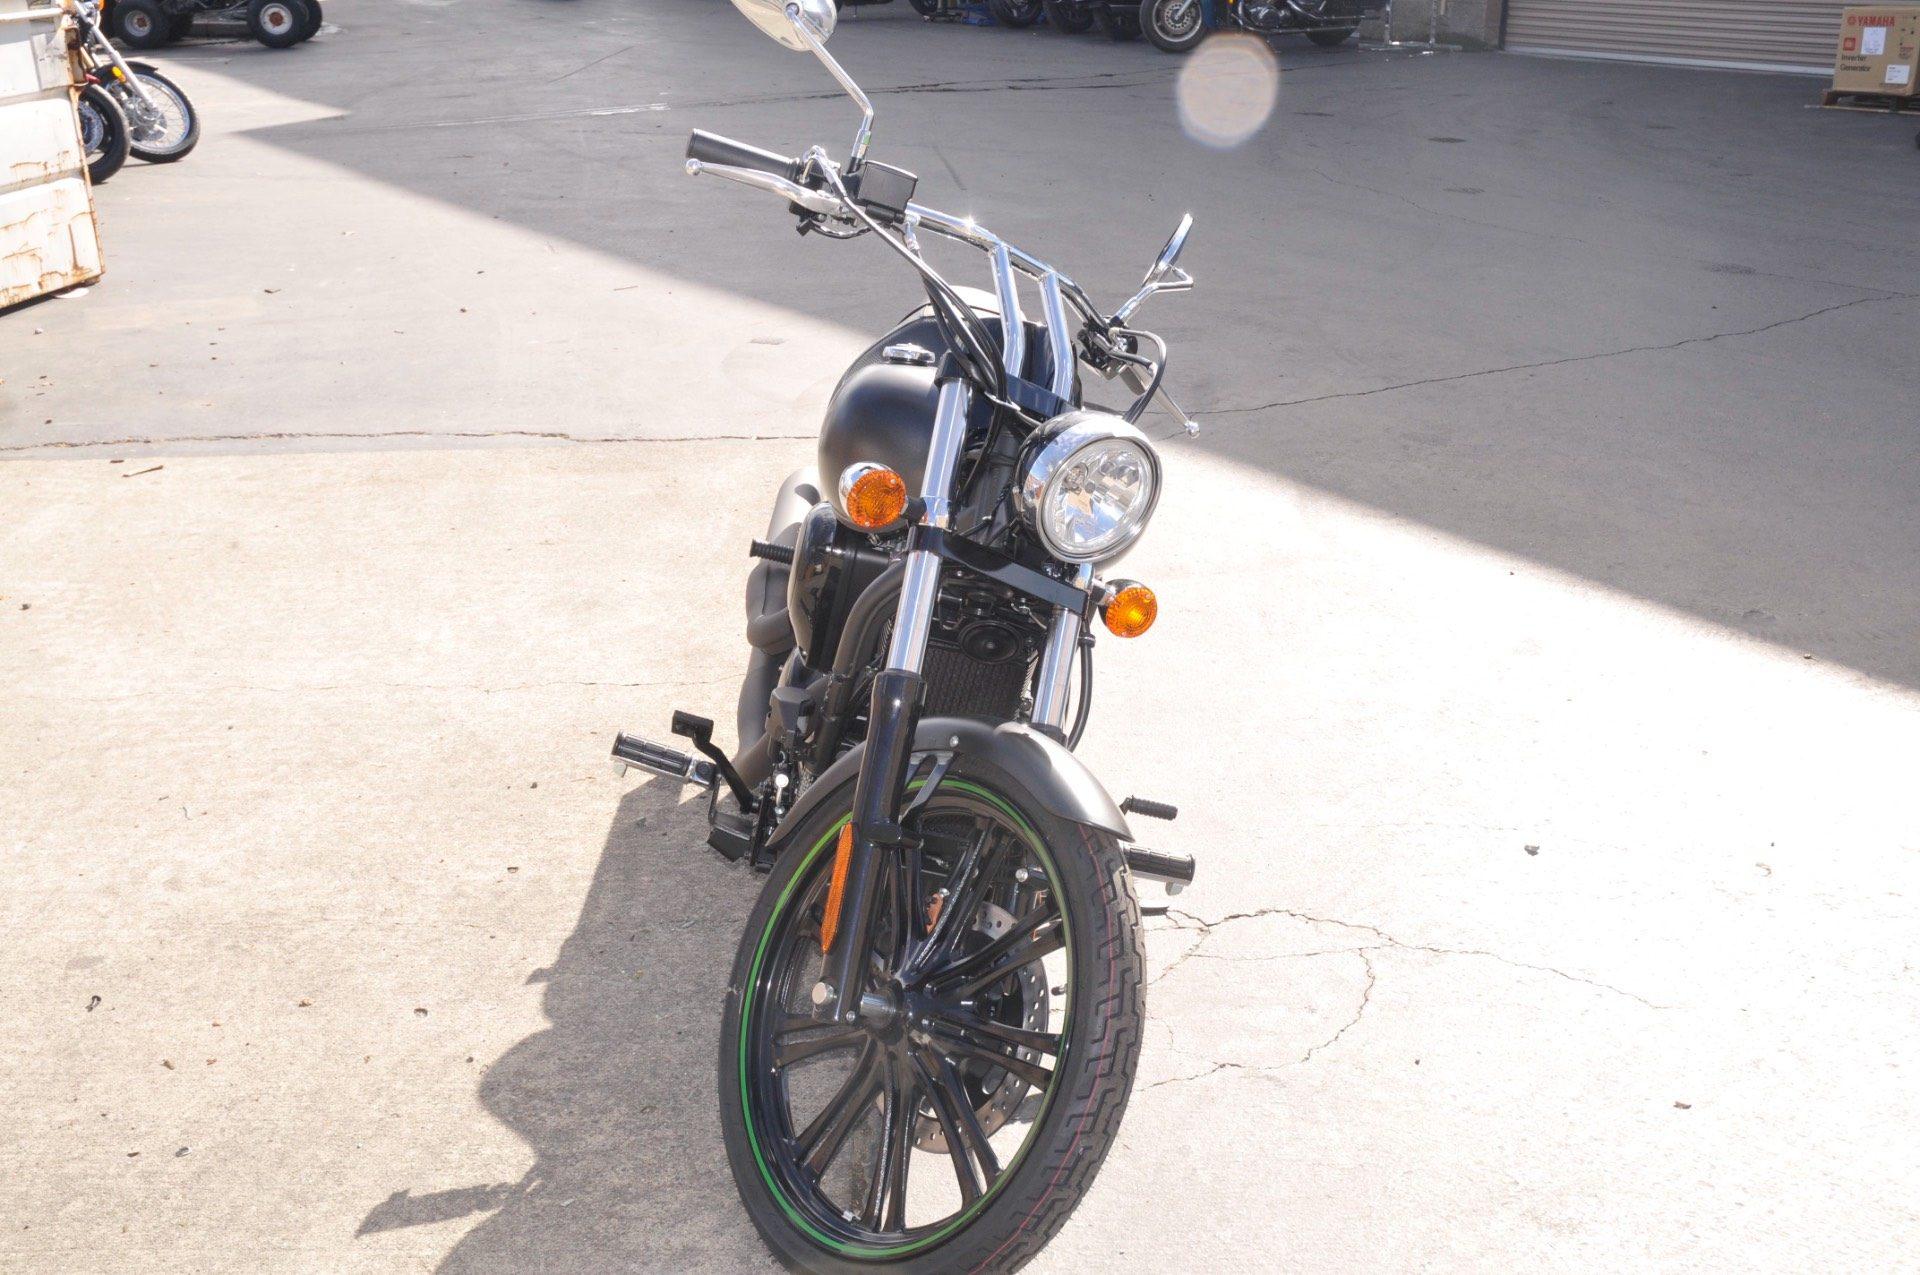 2017 Kawasaki Vulcan 900 Custom in Roseville, California